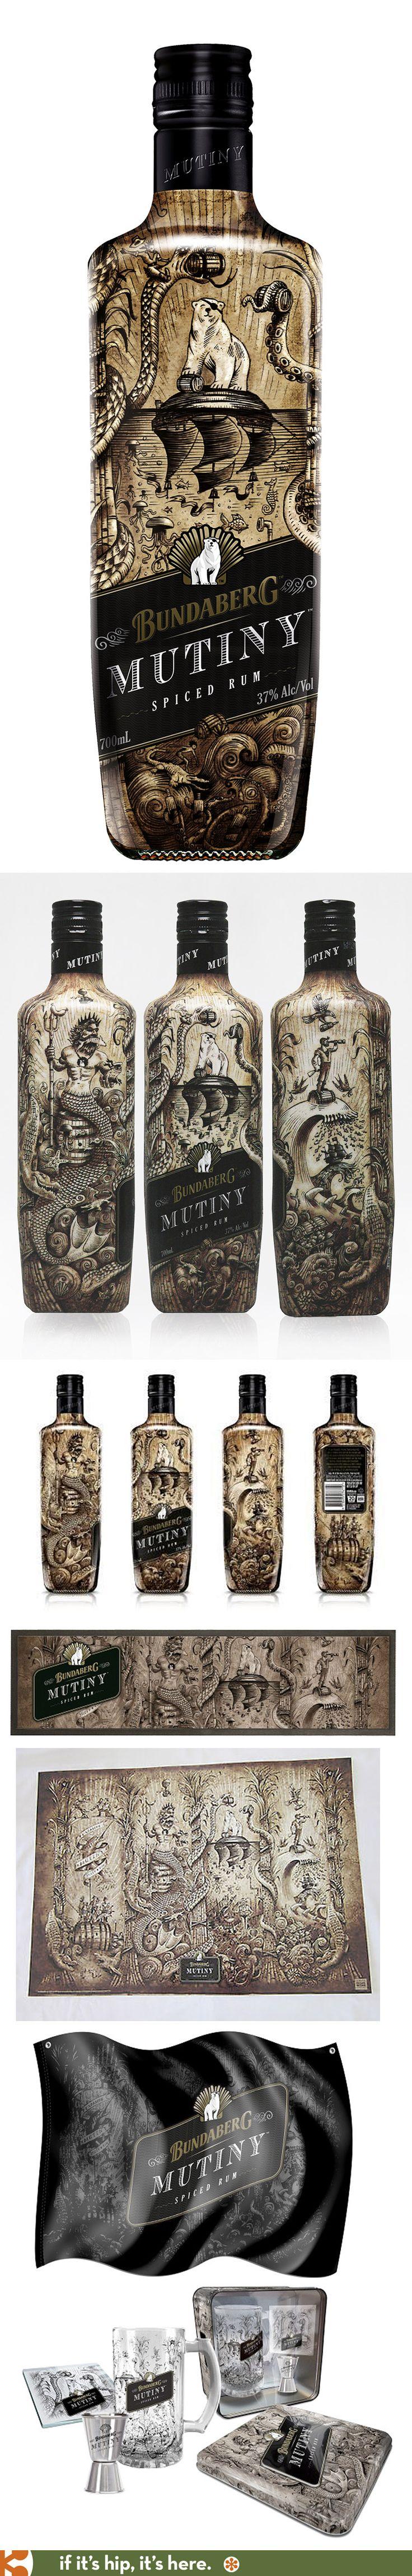 Australia's Bundaberg Mutiny Spiced Rum has a wonderfully illustrated #bottle…